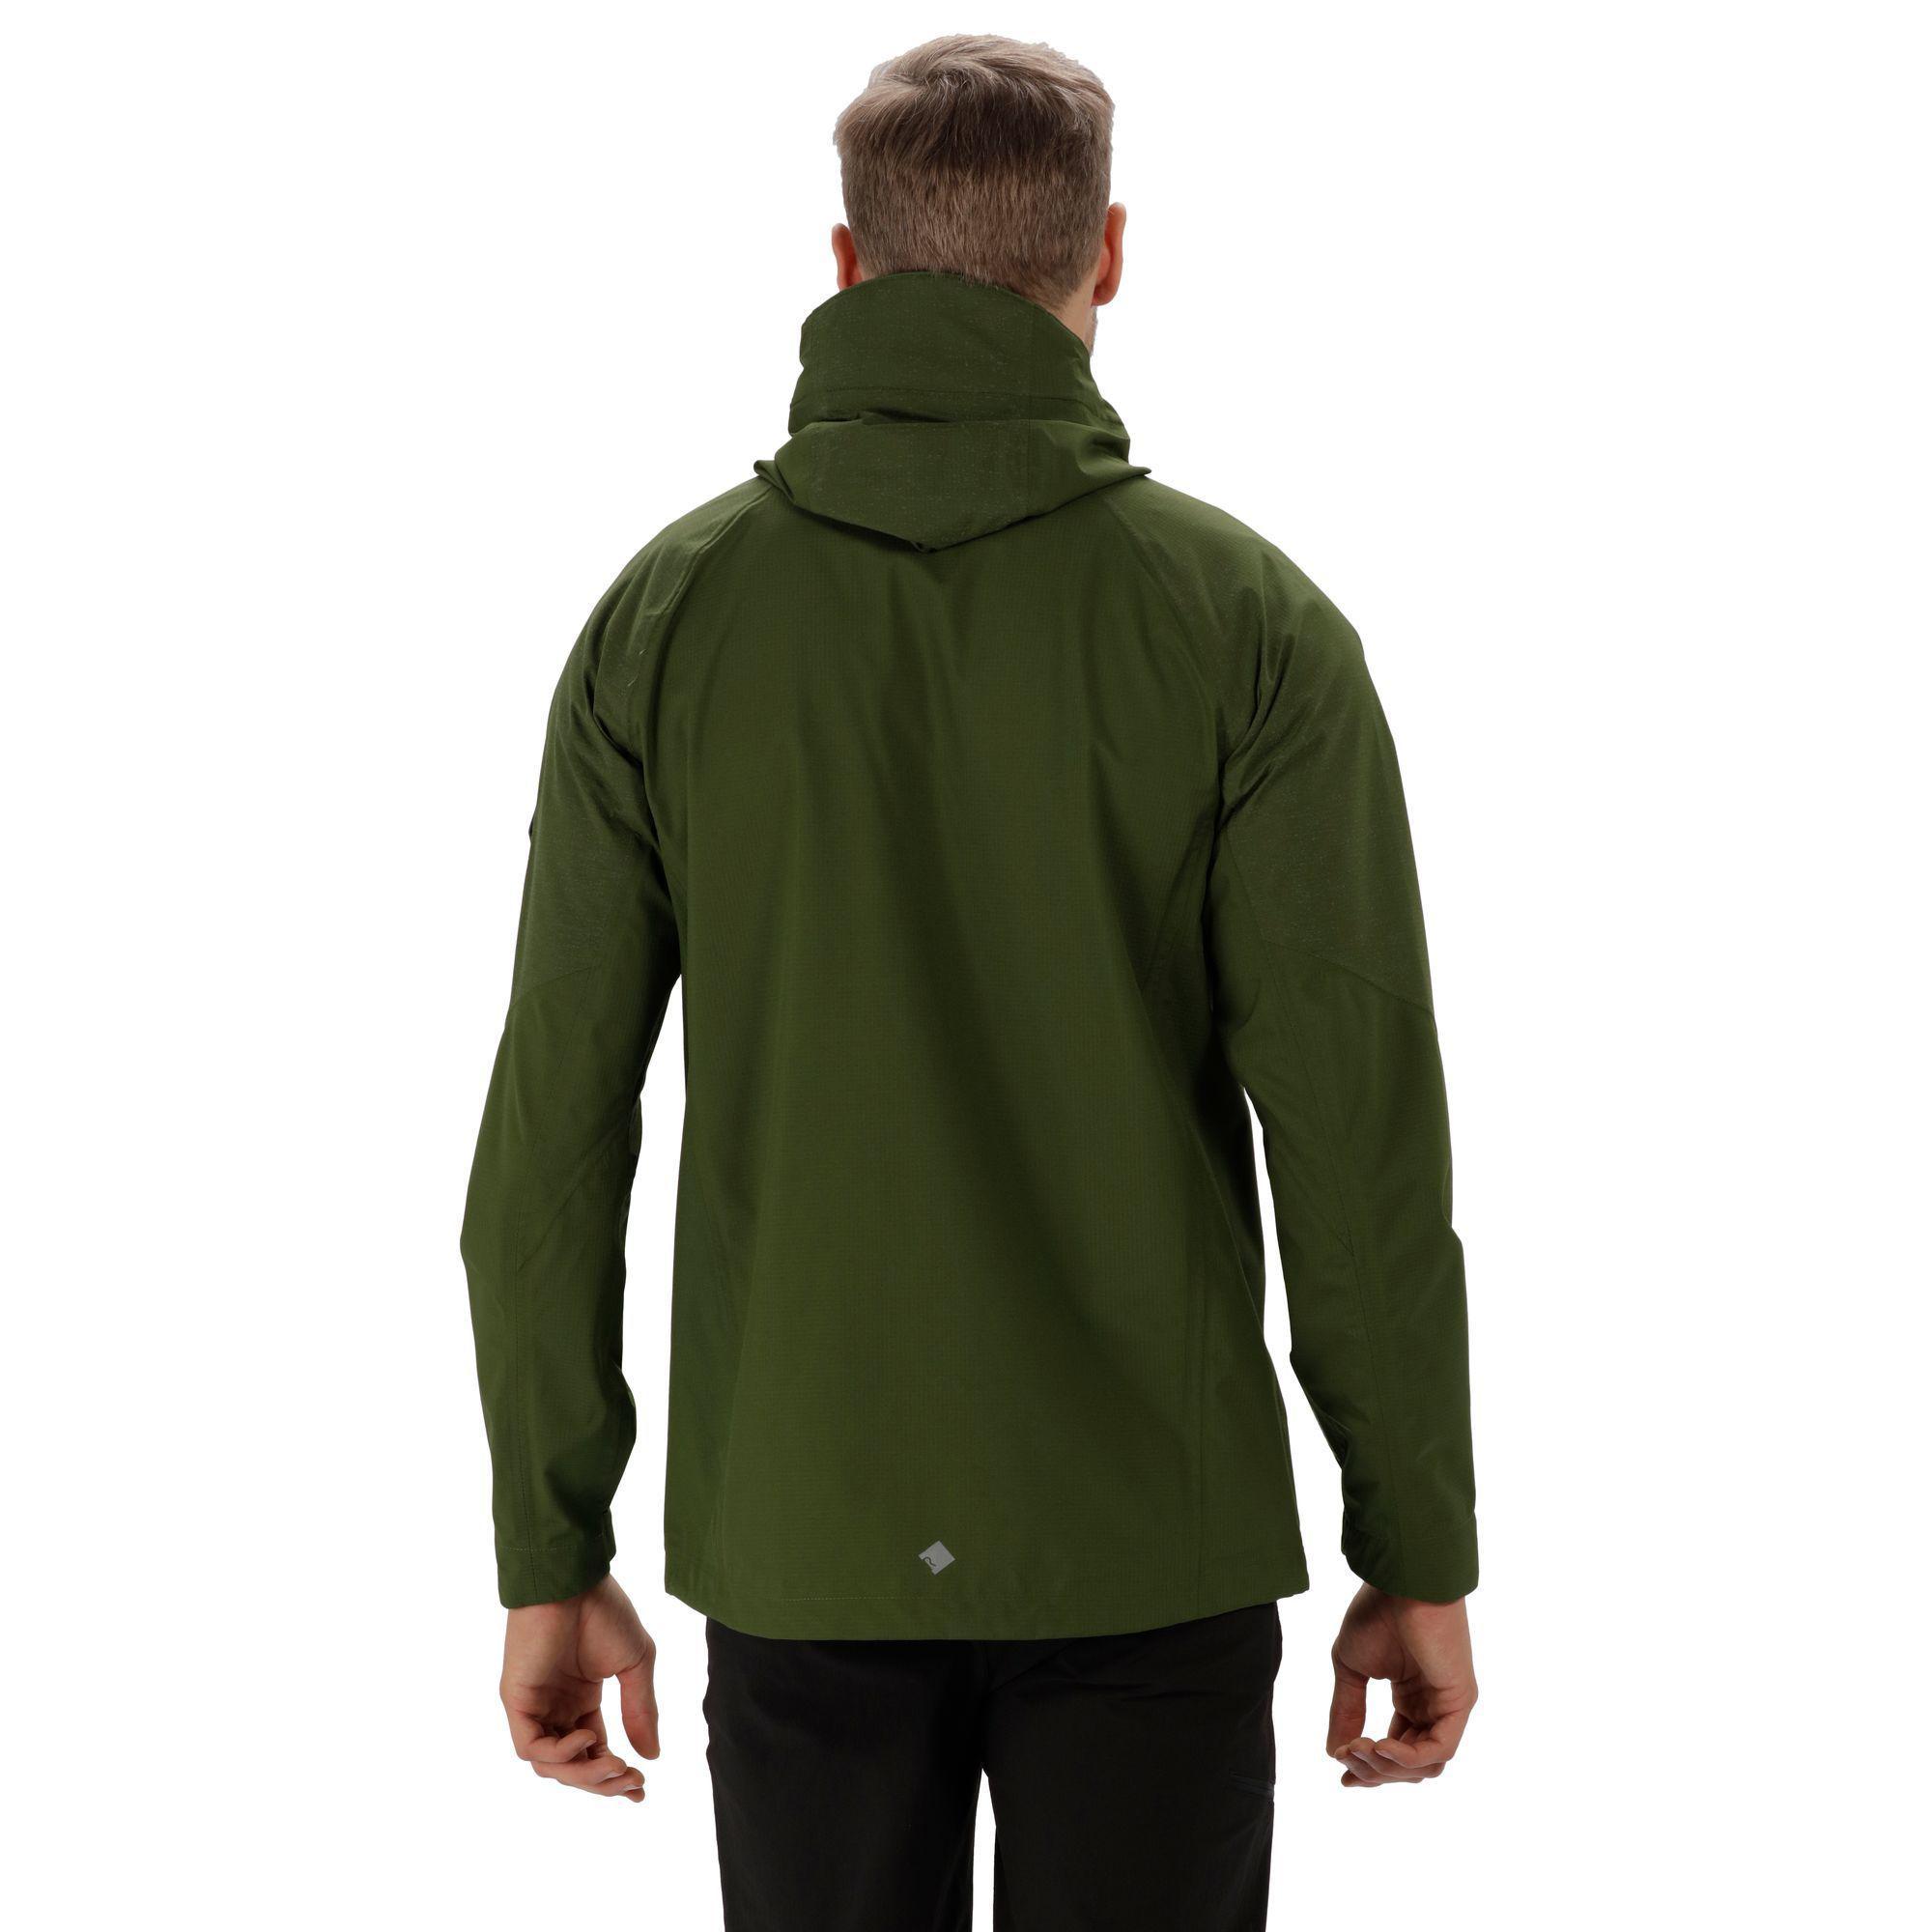 Regatta Synthetic Green 'montegra' Waterproof Jacket for Men